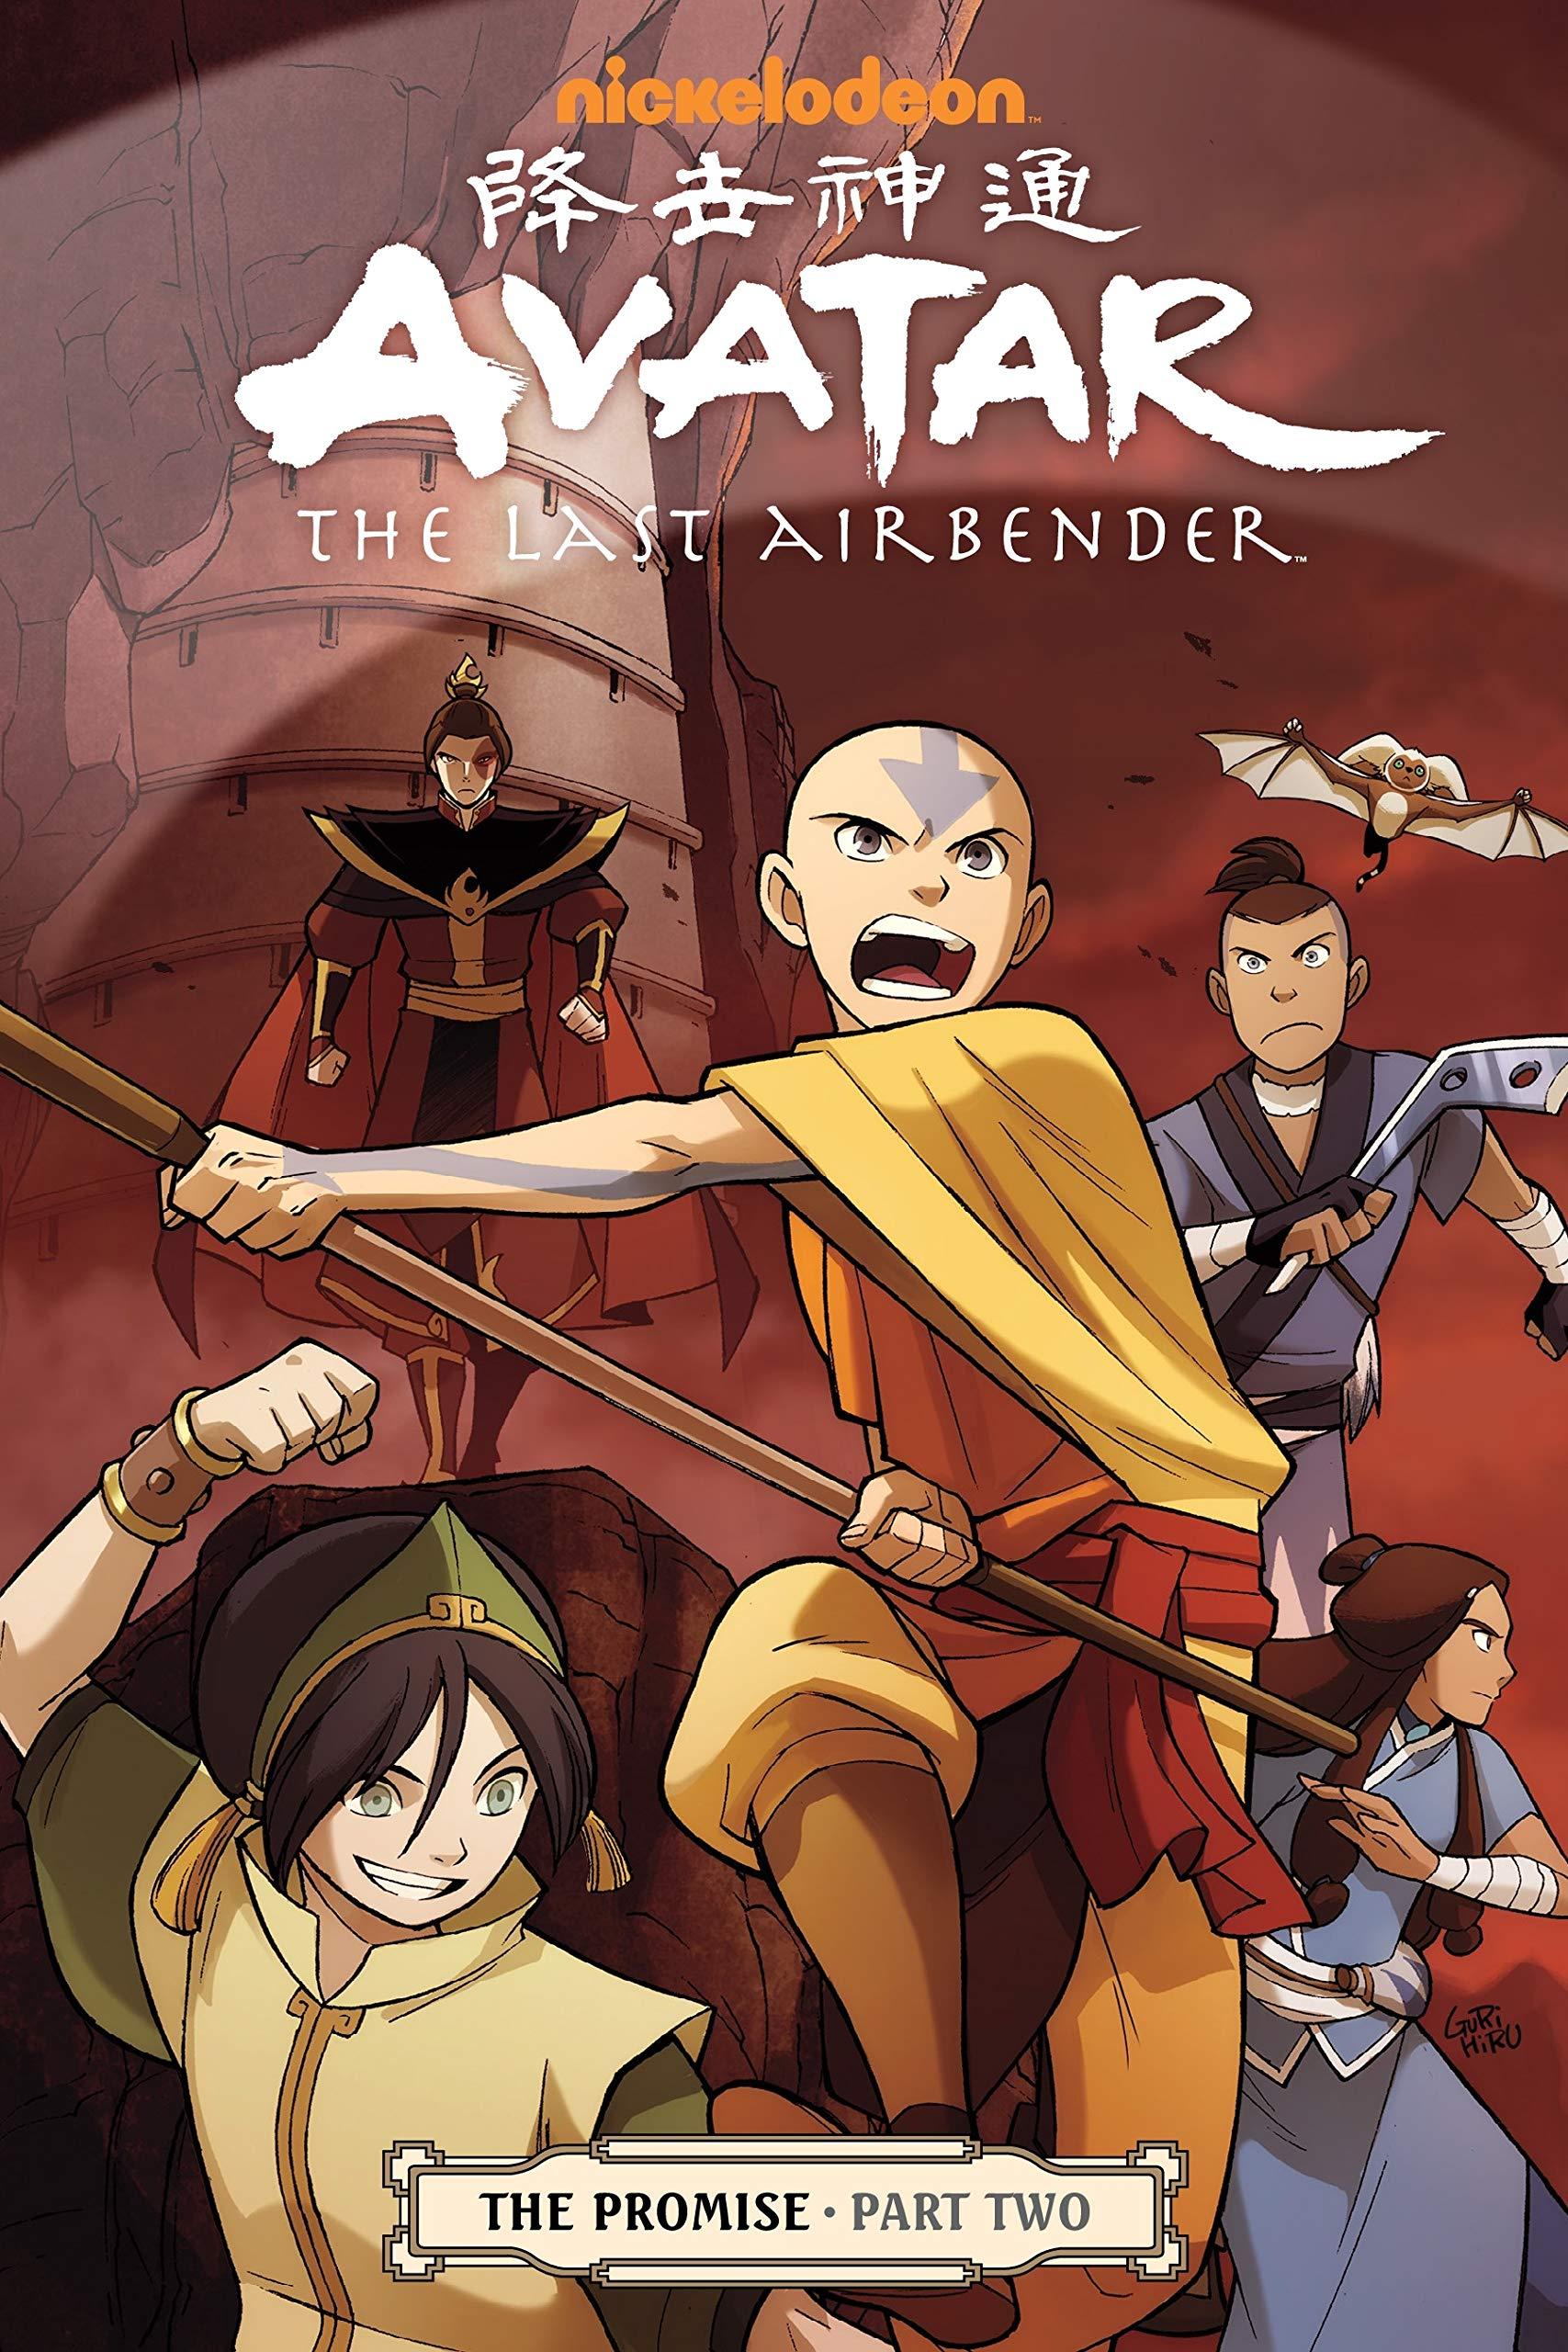 Amazon.com: Avatar: The Last Airbender: The Promise, Part 2  (9781595828750): Yang, Gene Luen, Koneitzko, Bryan, Various, Gurihiru: Books